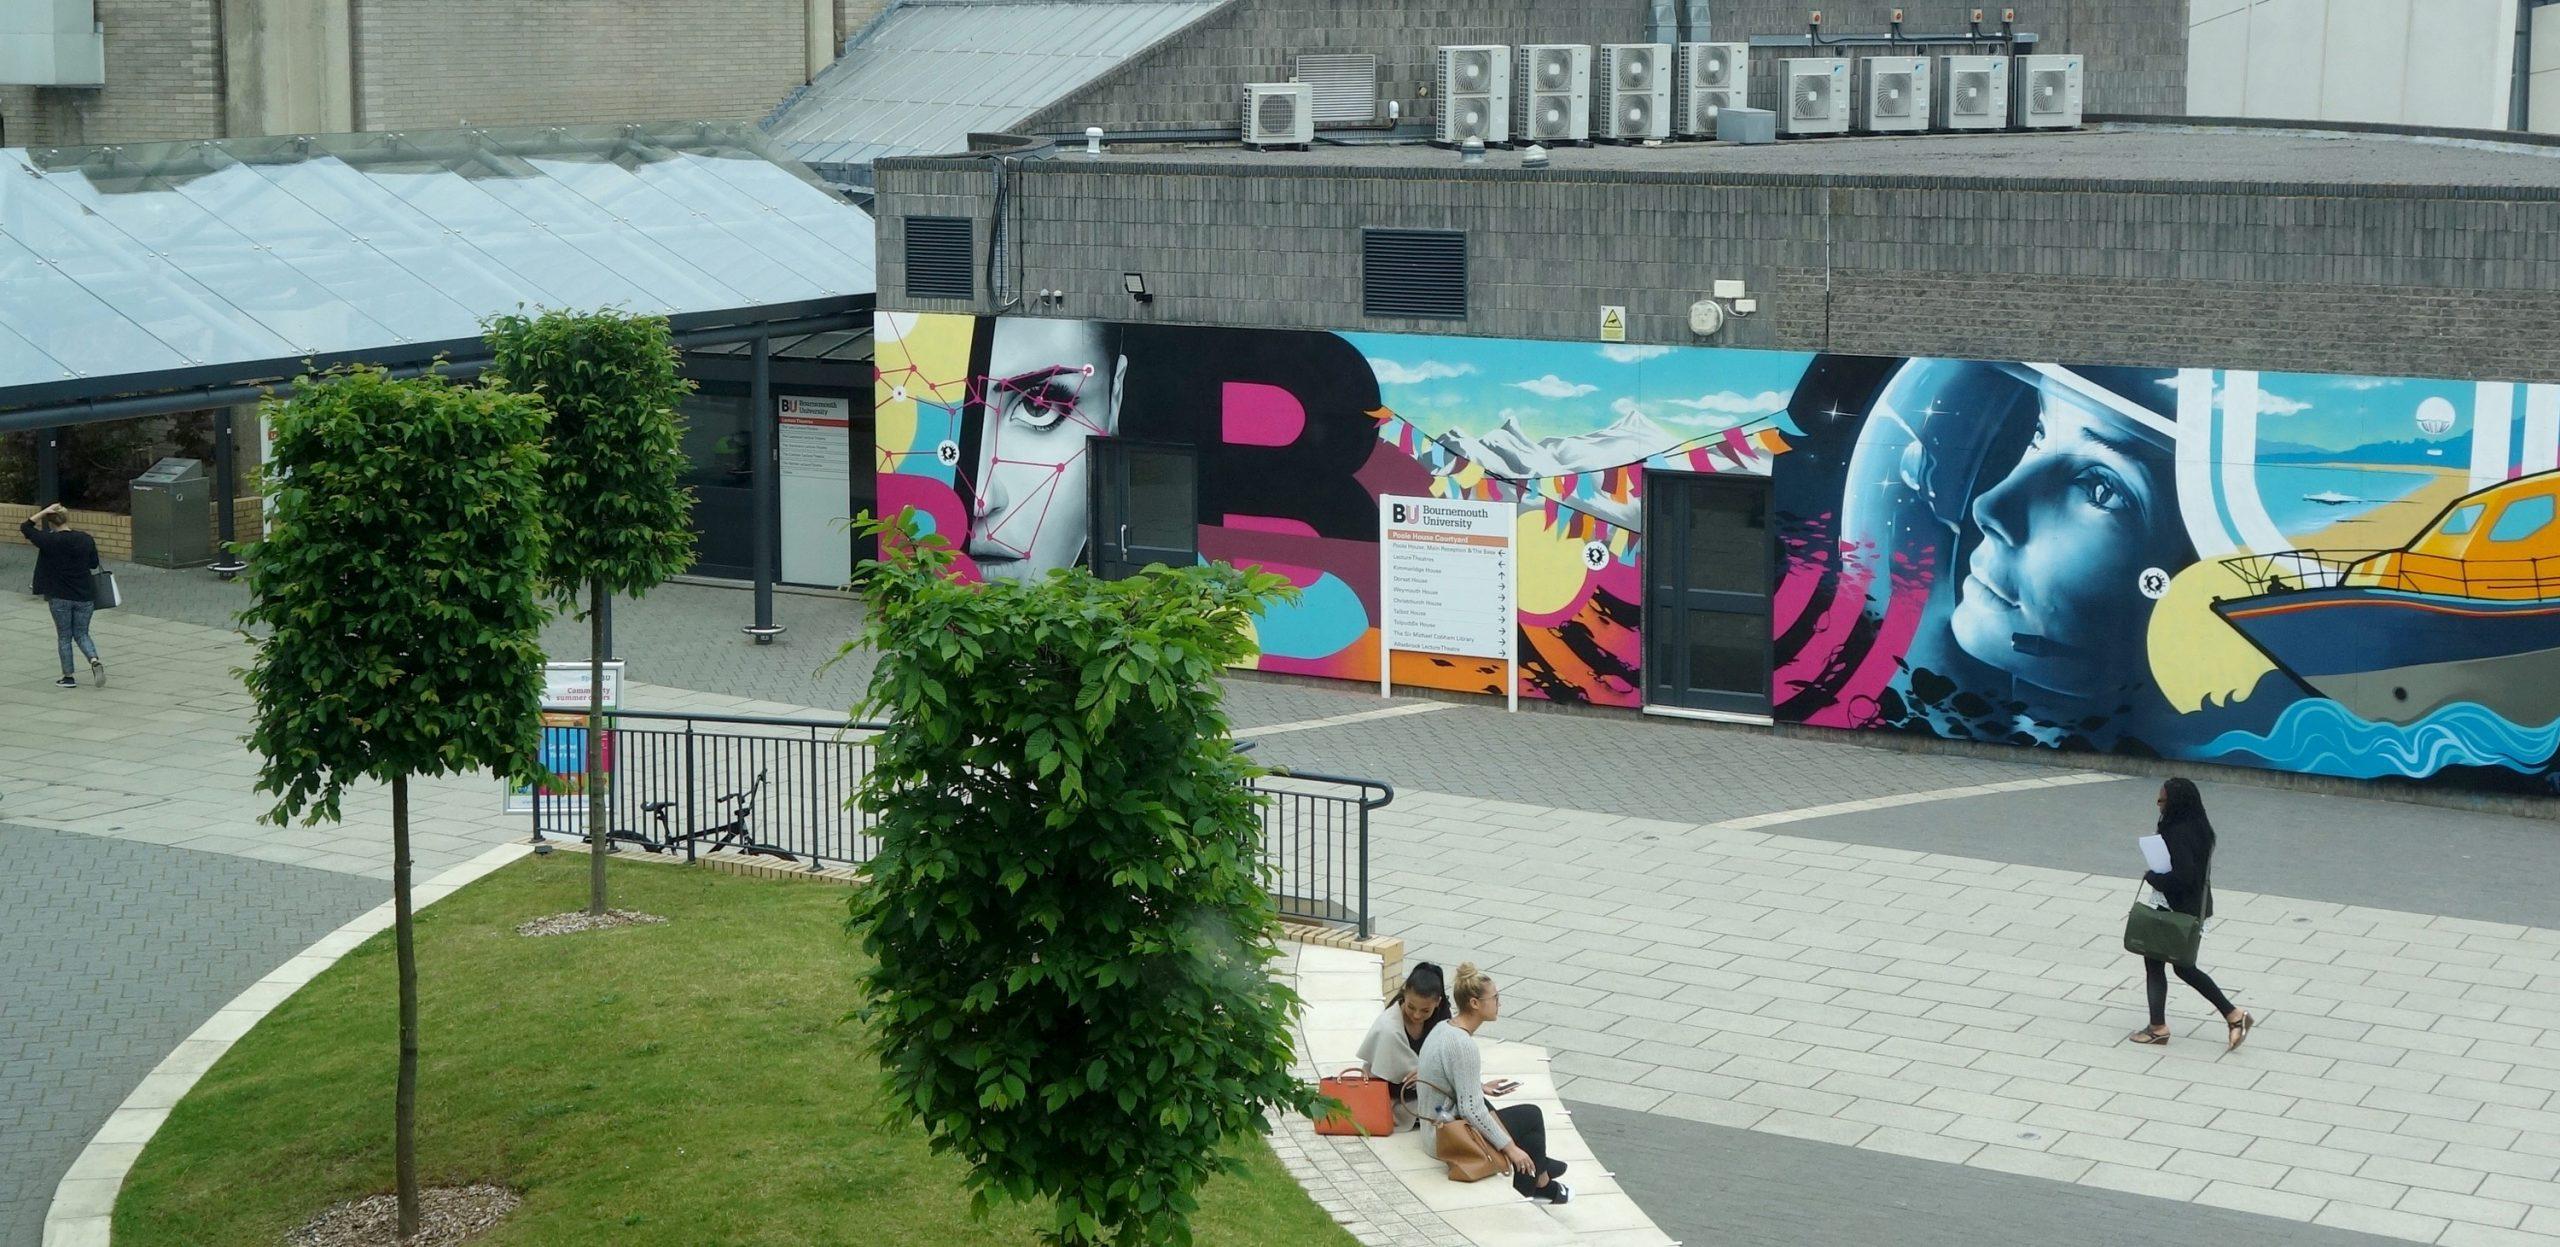 BOURNEMOUTH UNIVERSITY FUSION BUILDING EXTERIOR STREET ART GRAFFIITI MURAL & DESIGN PAINTSHOP STUDIO